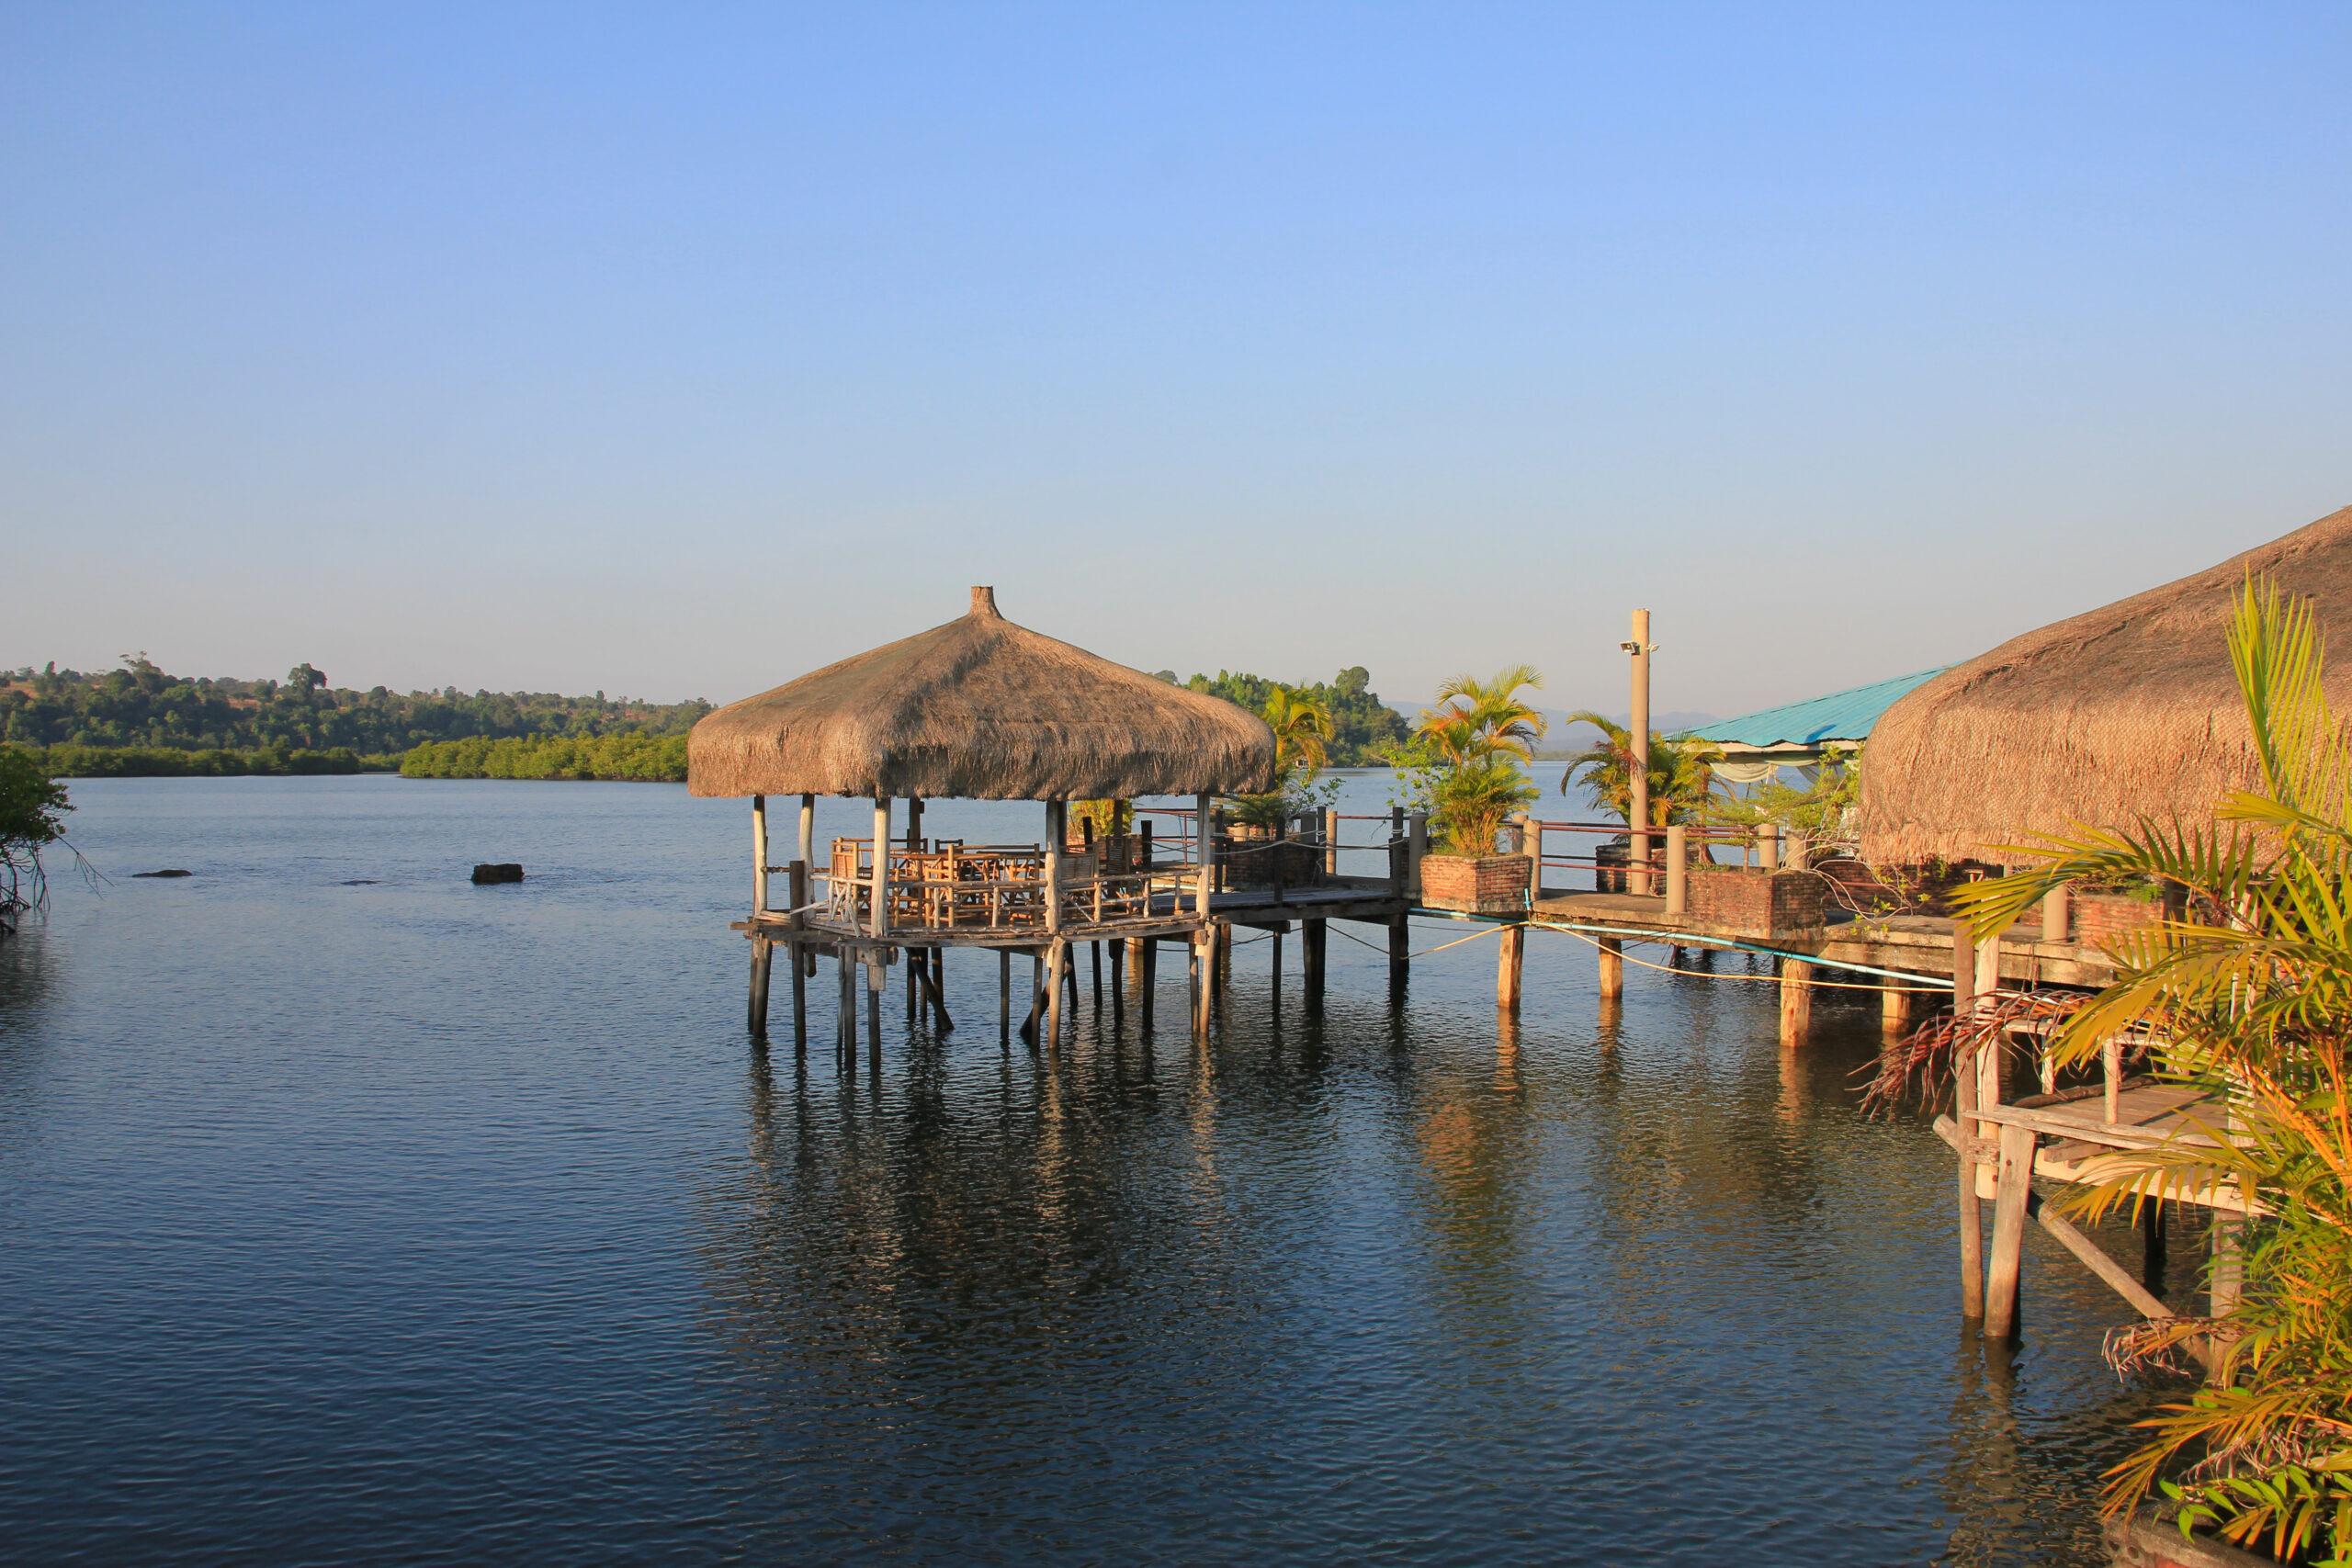 Lagune bei Koh Kong, mit Stelzenhäusern